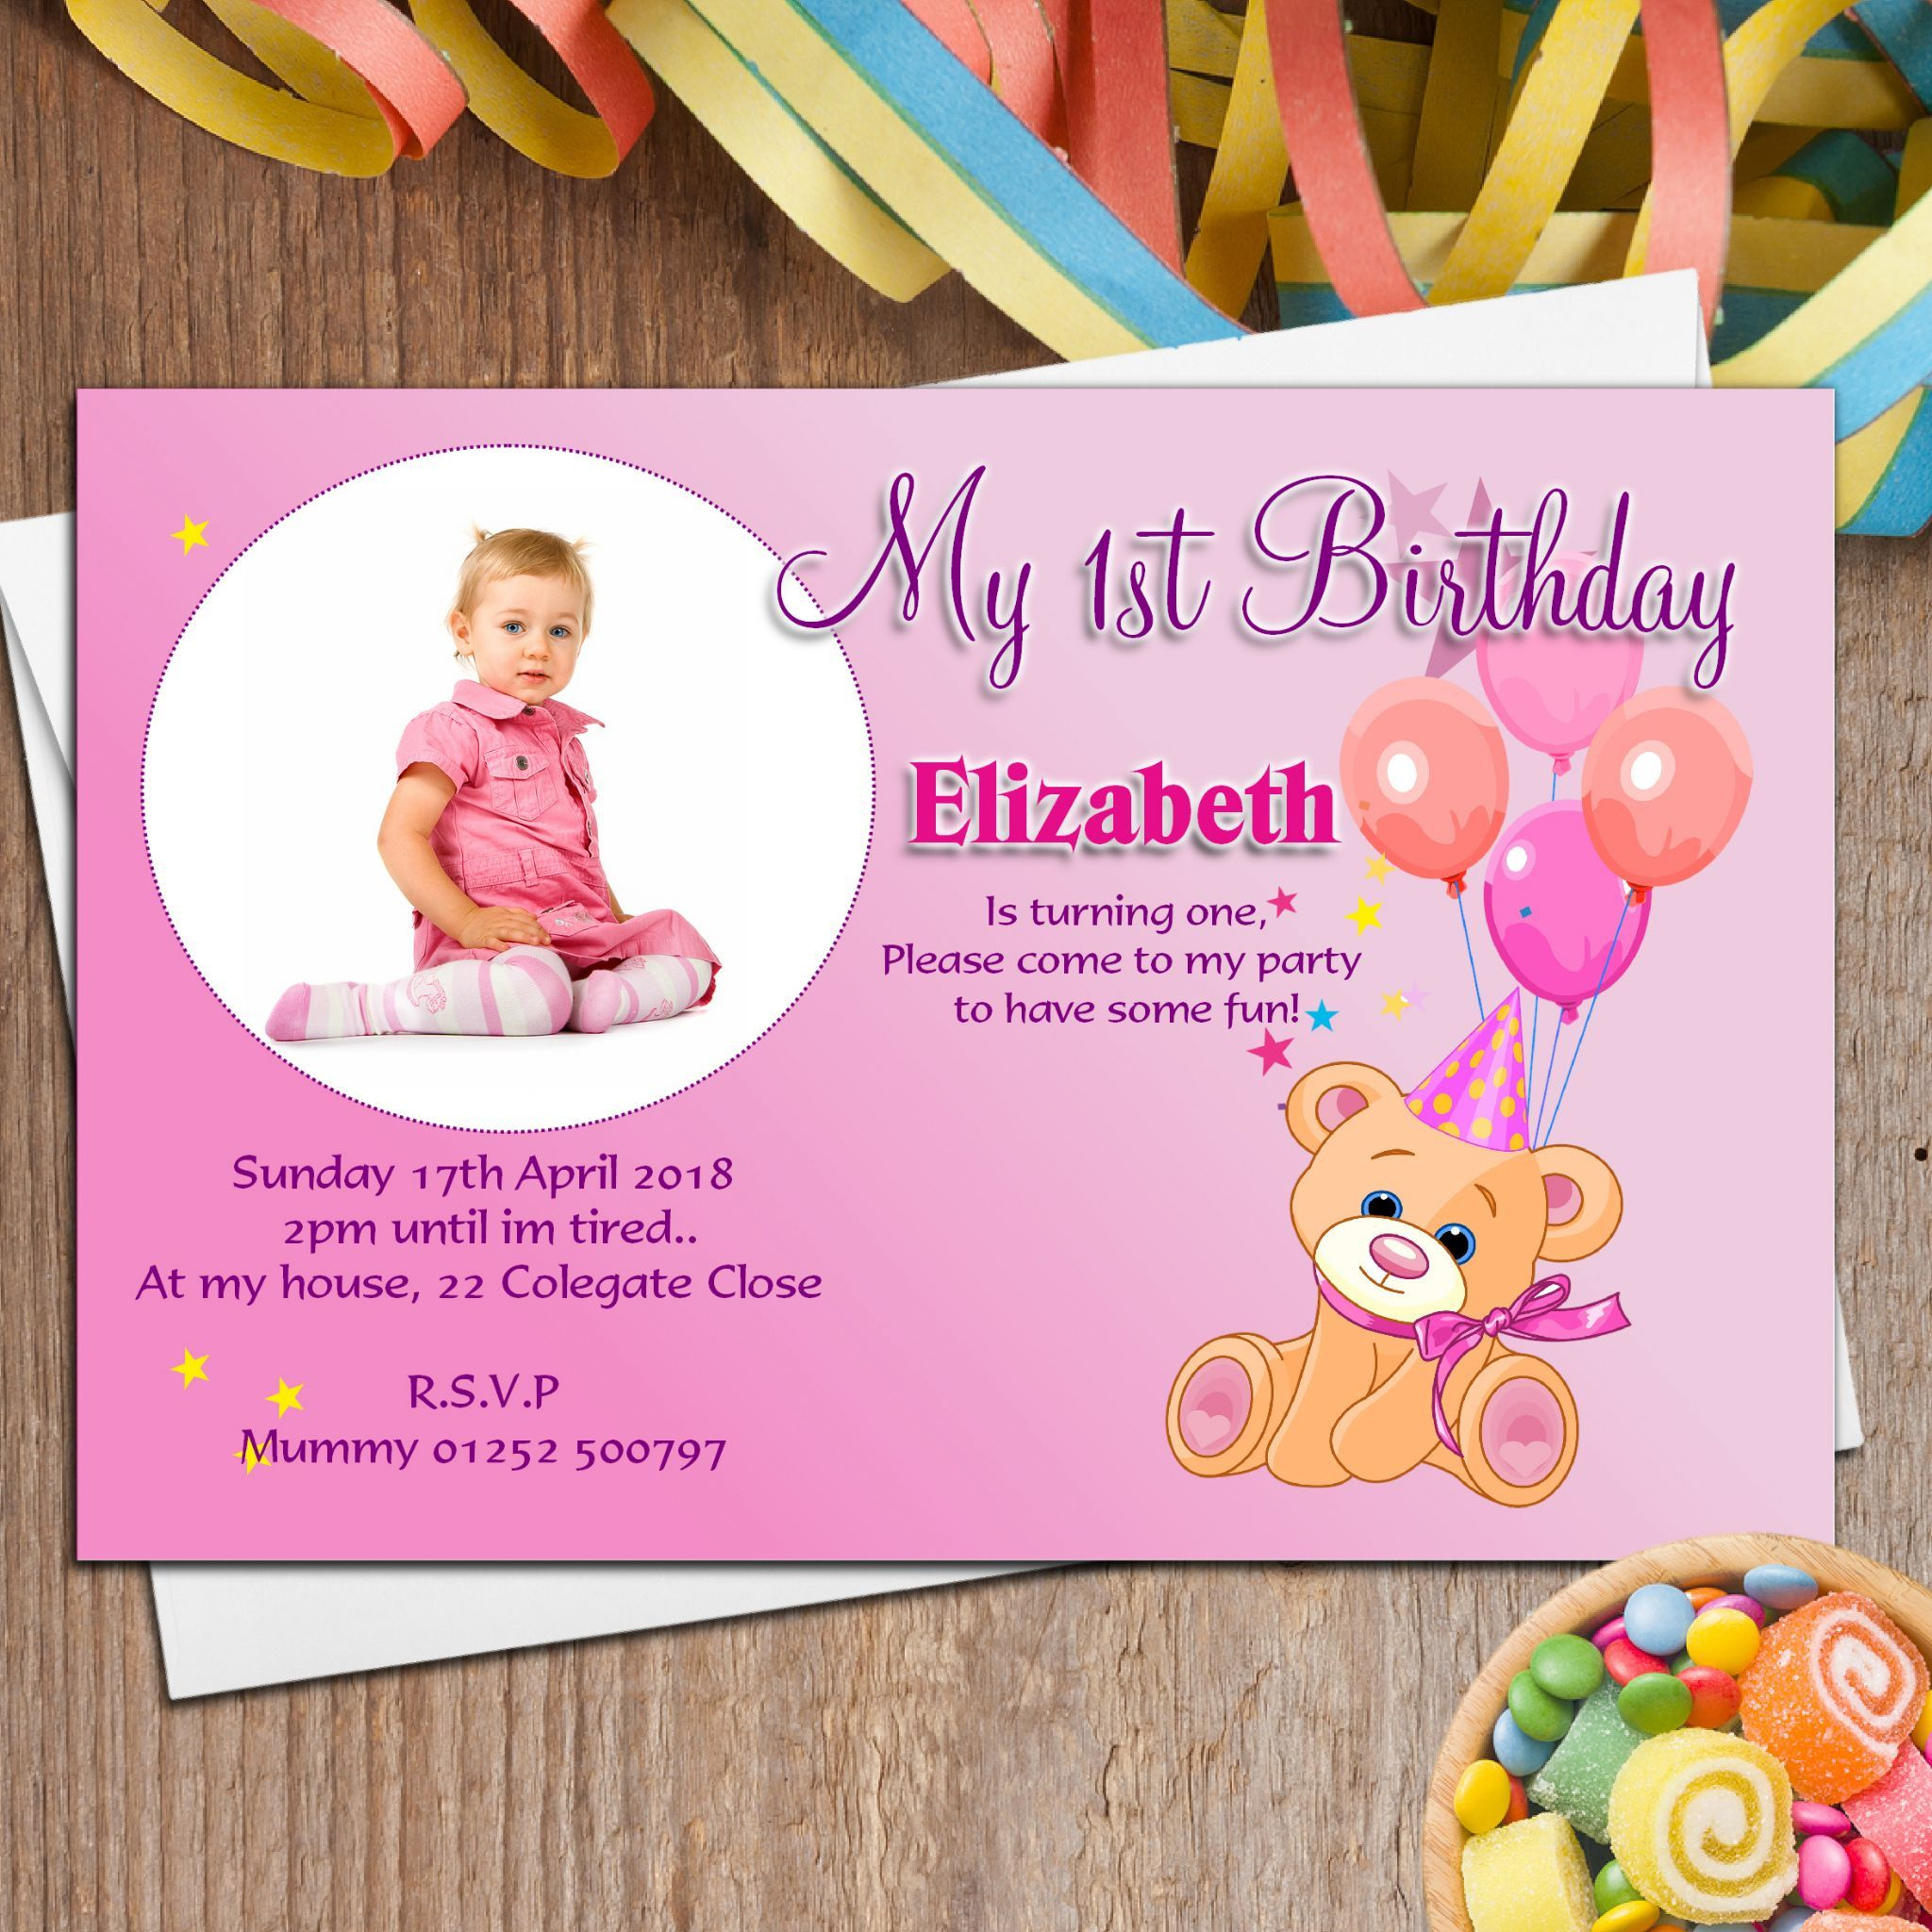 Online Bday Invitation Card